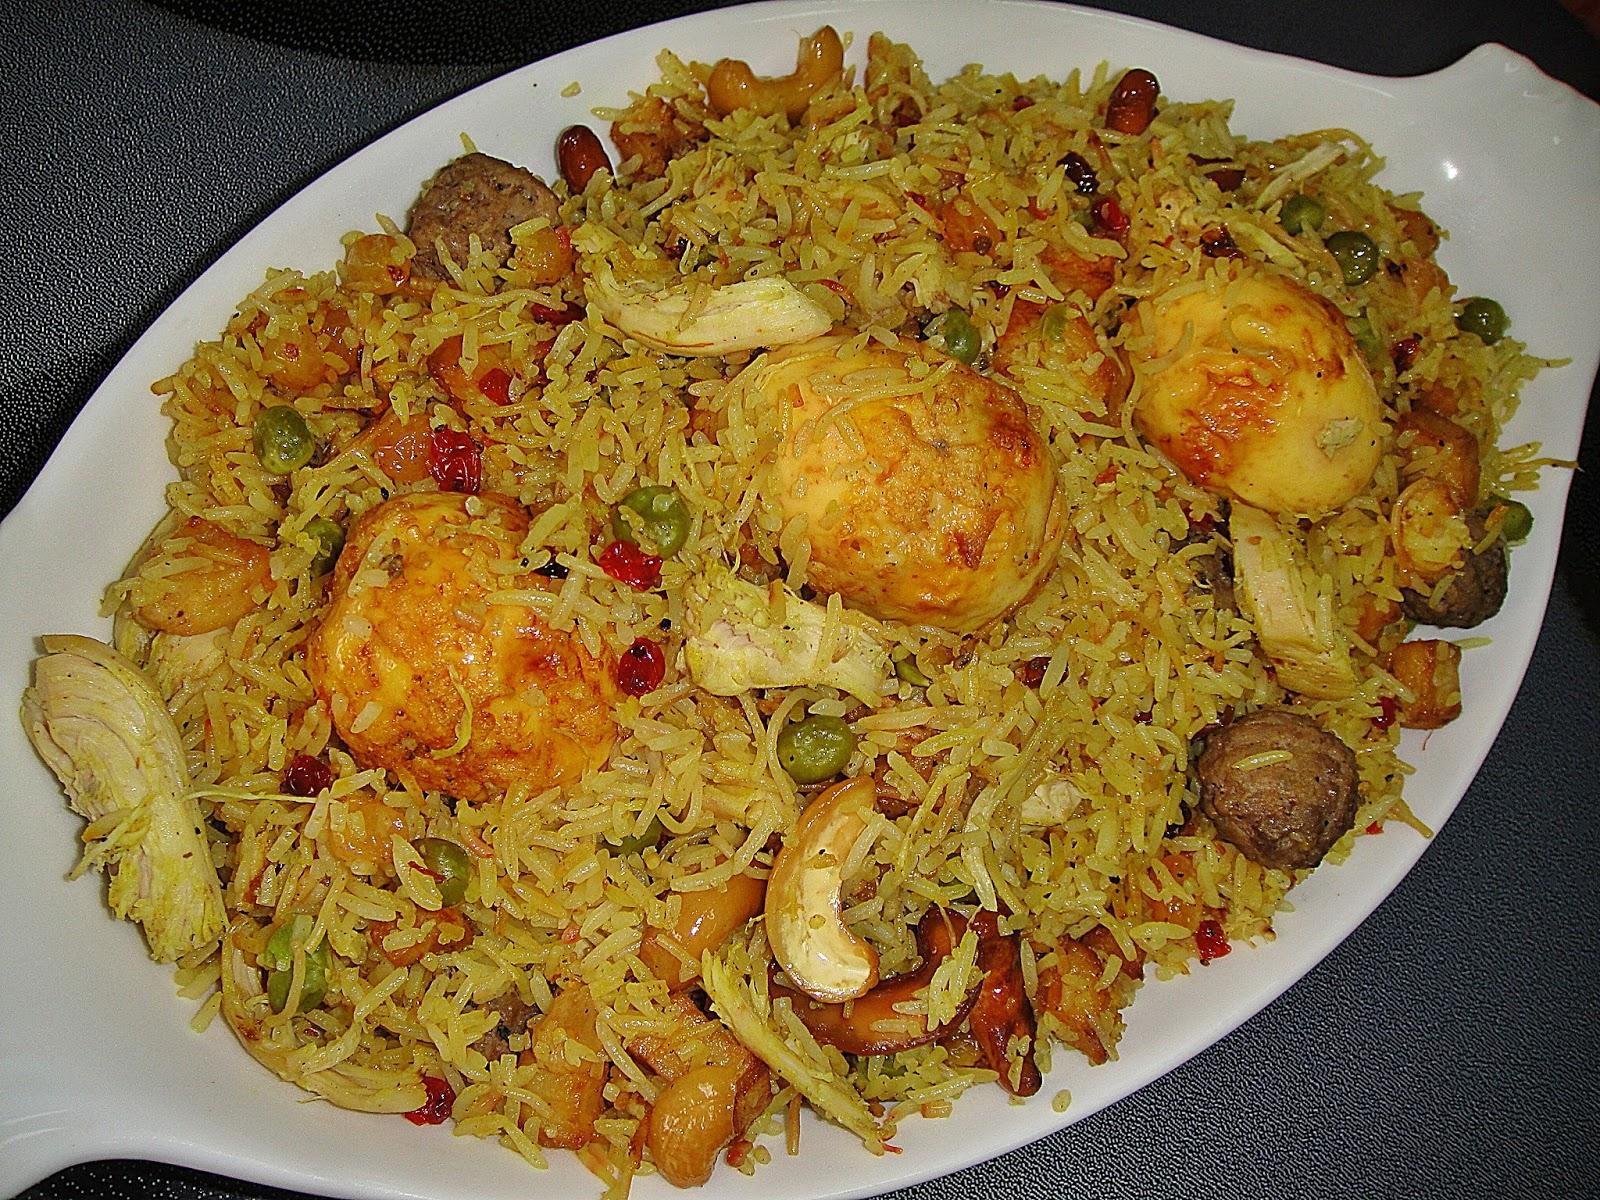 Cucina irachena: il biryani - Arabpress